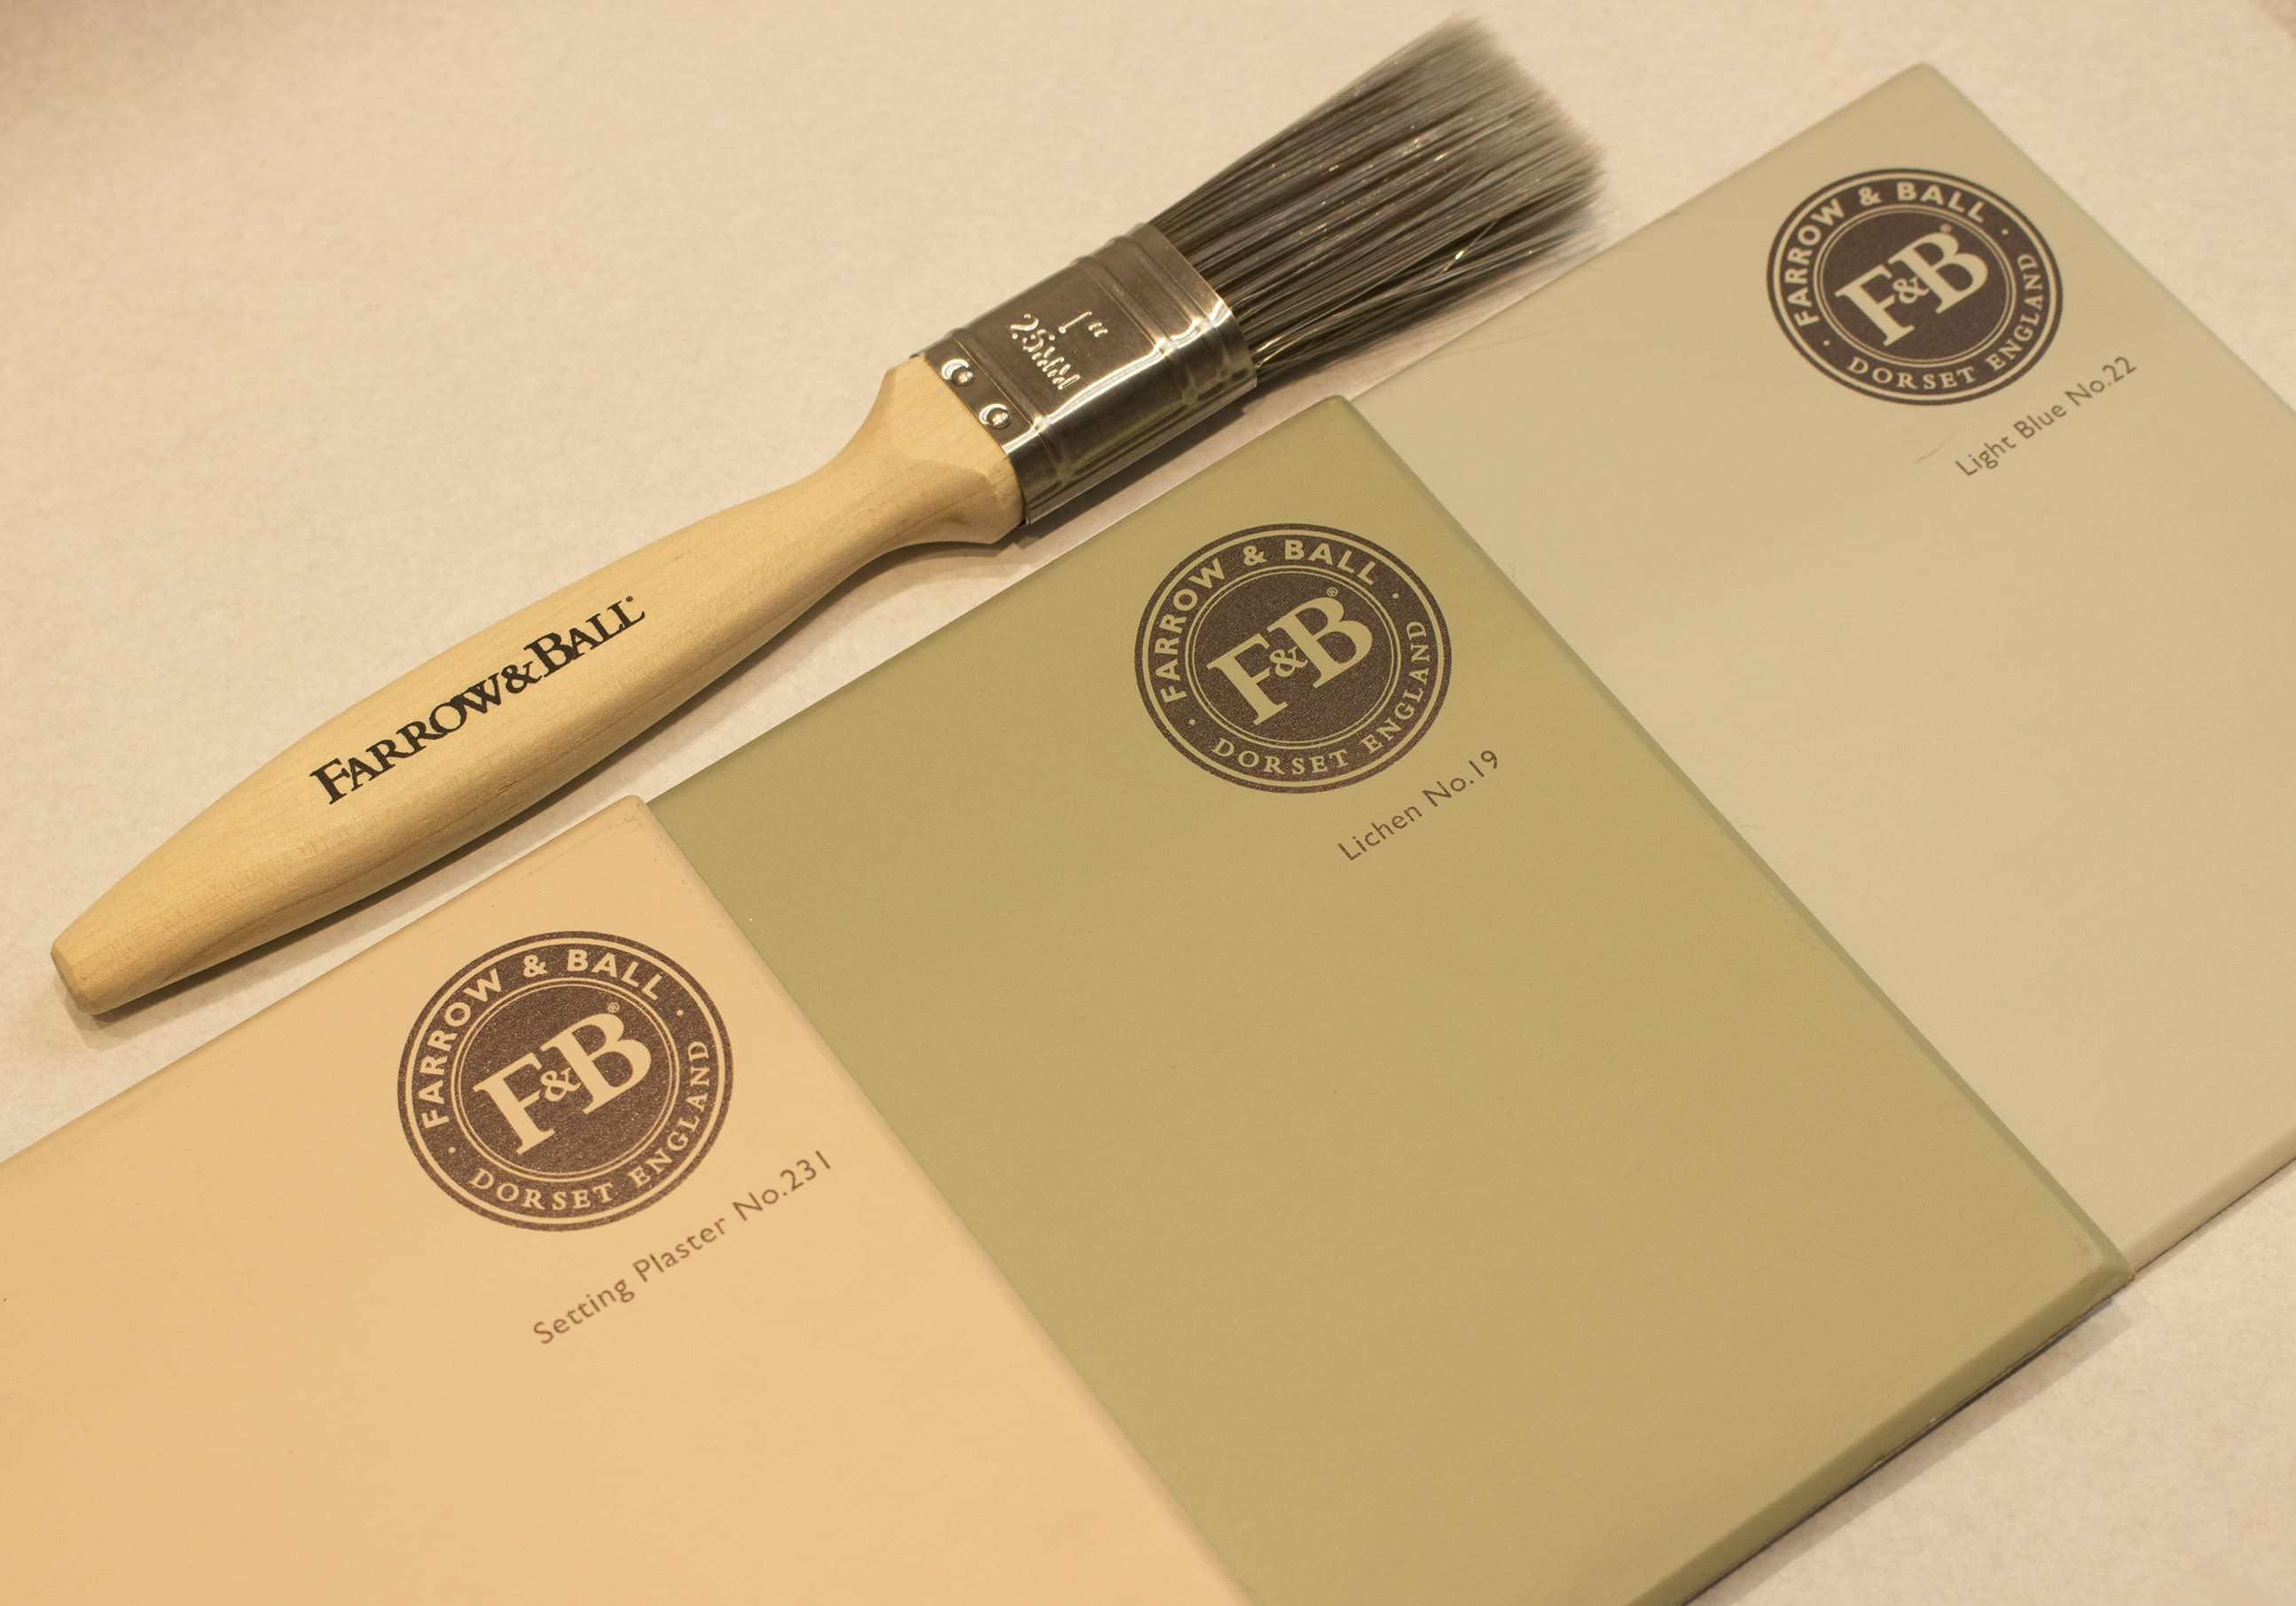 farrow&ball, farrow and ball, paint, decorating, paint brush